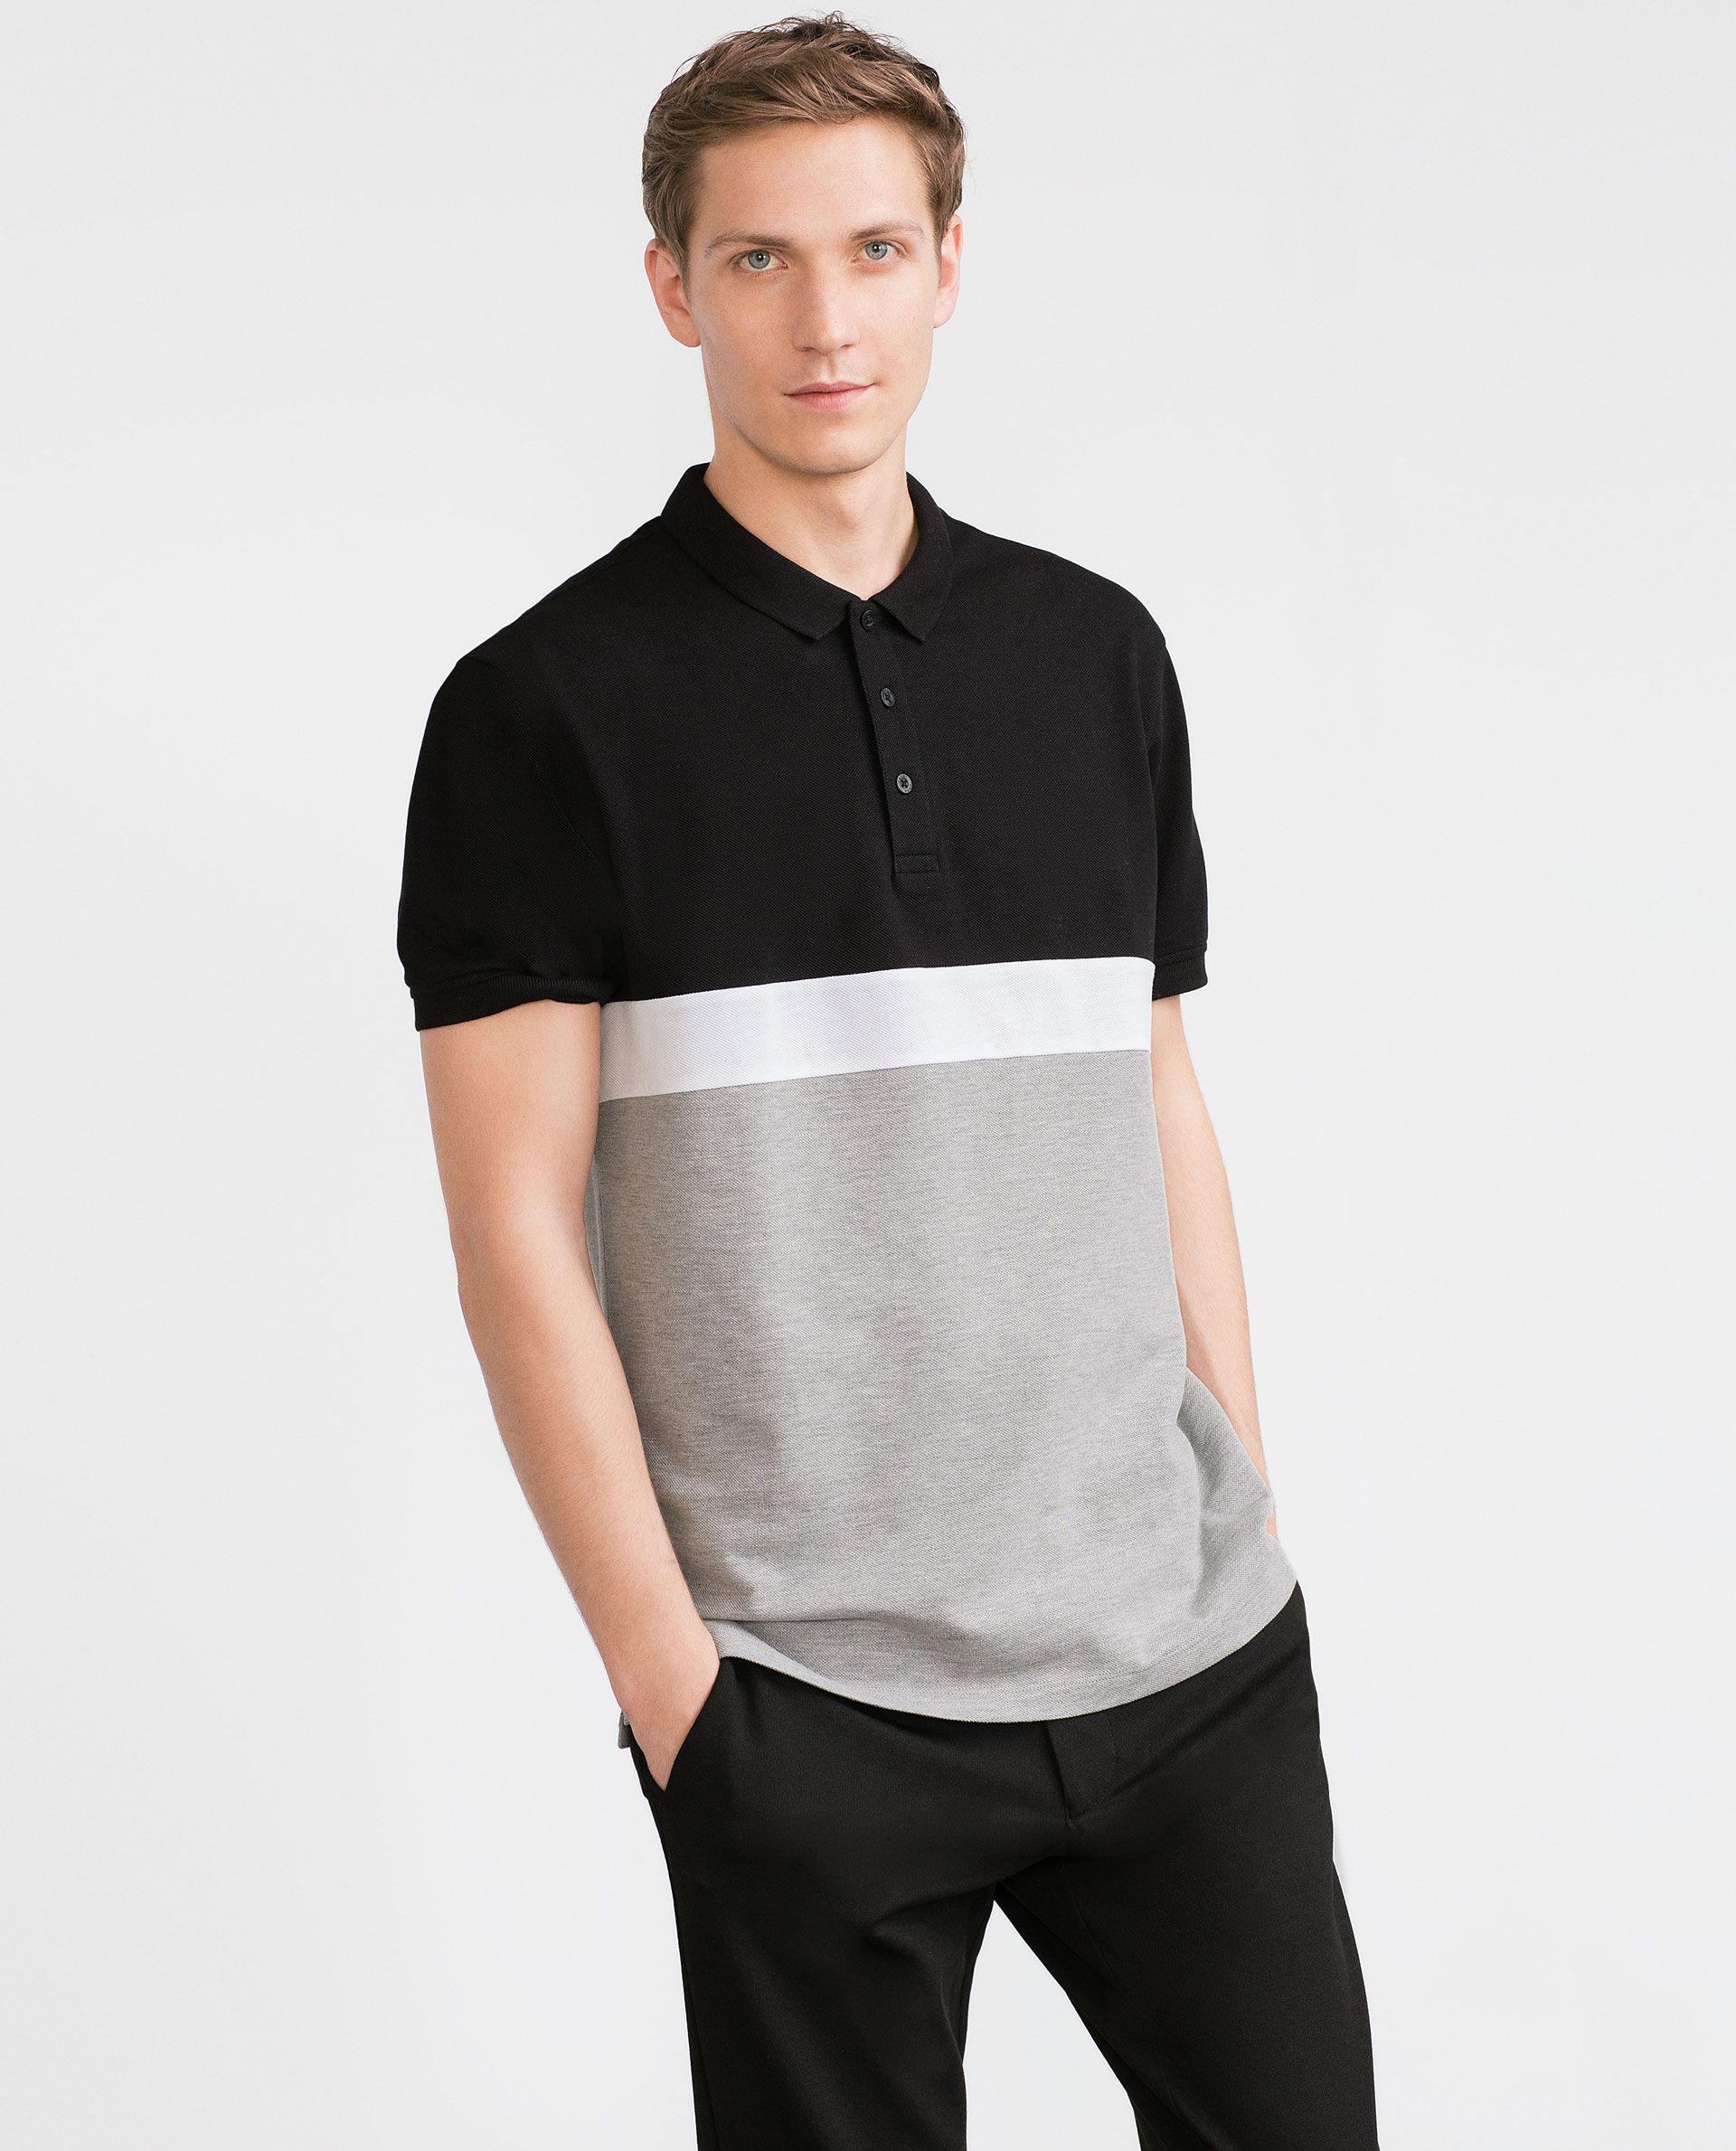 Piqu Polo Shirt Polo Shirts Man Zara Belgium Man The Man